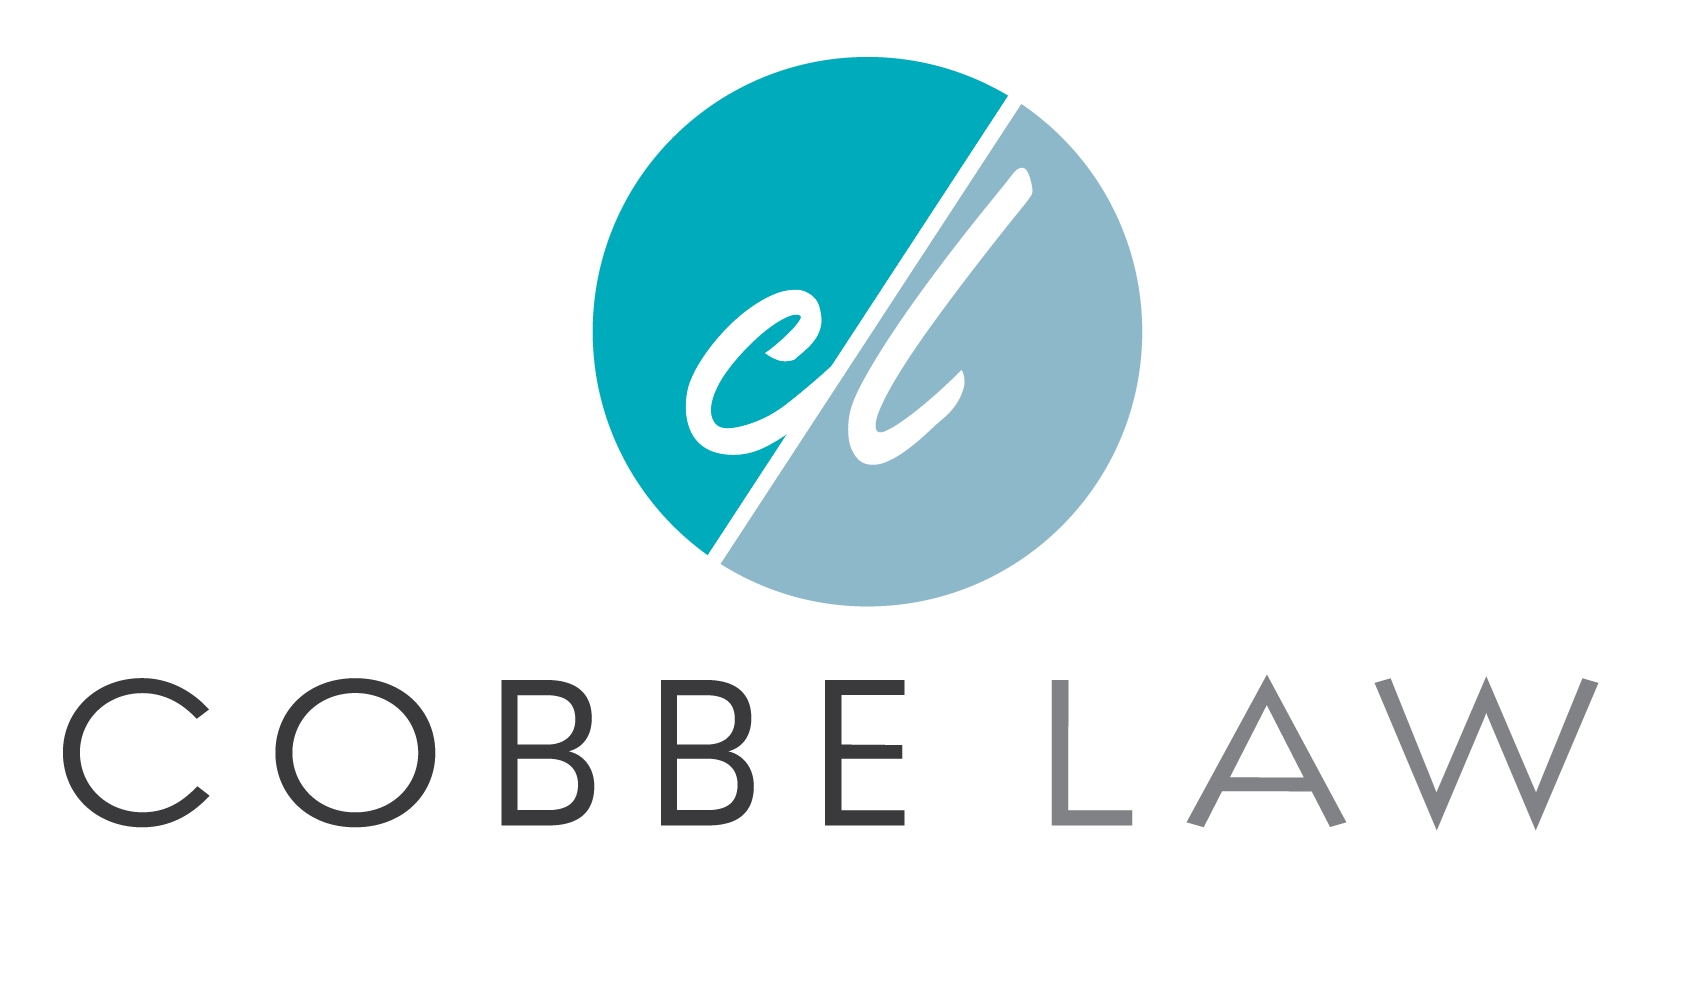 Cobbe Law